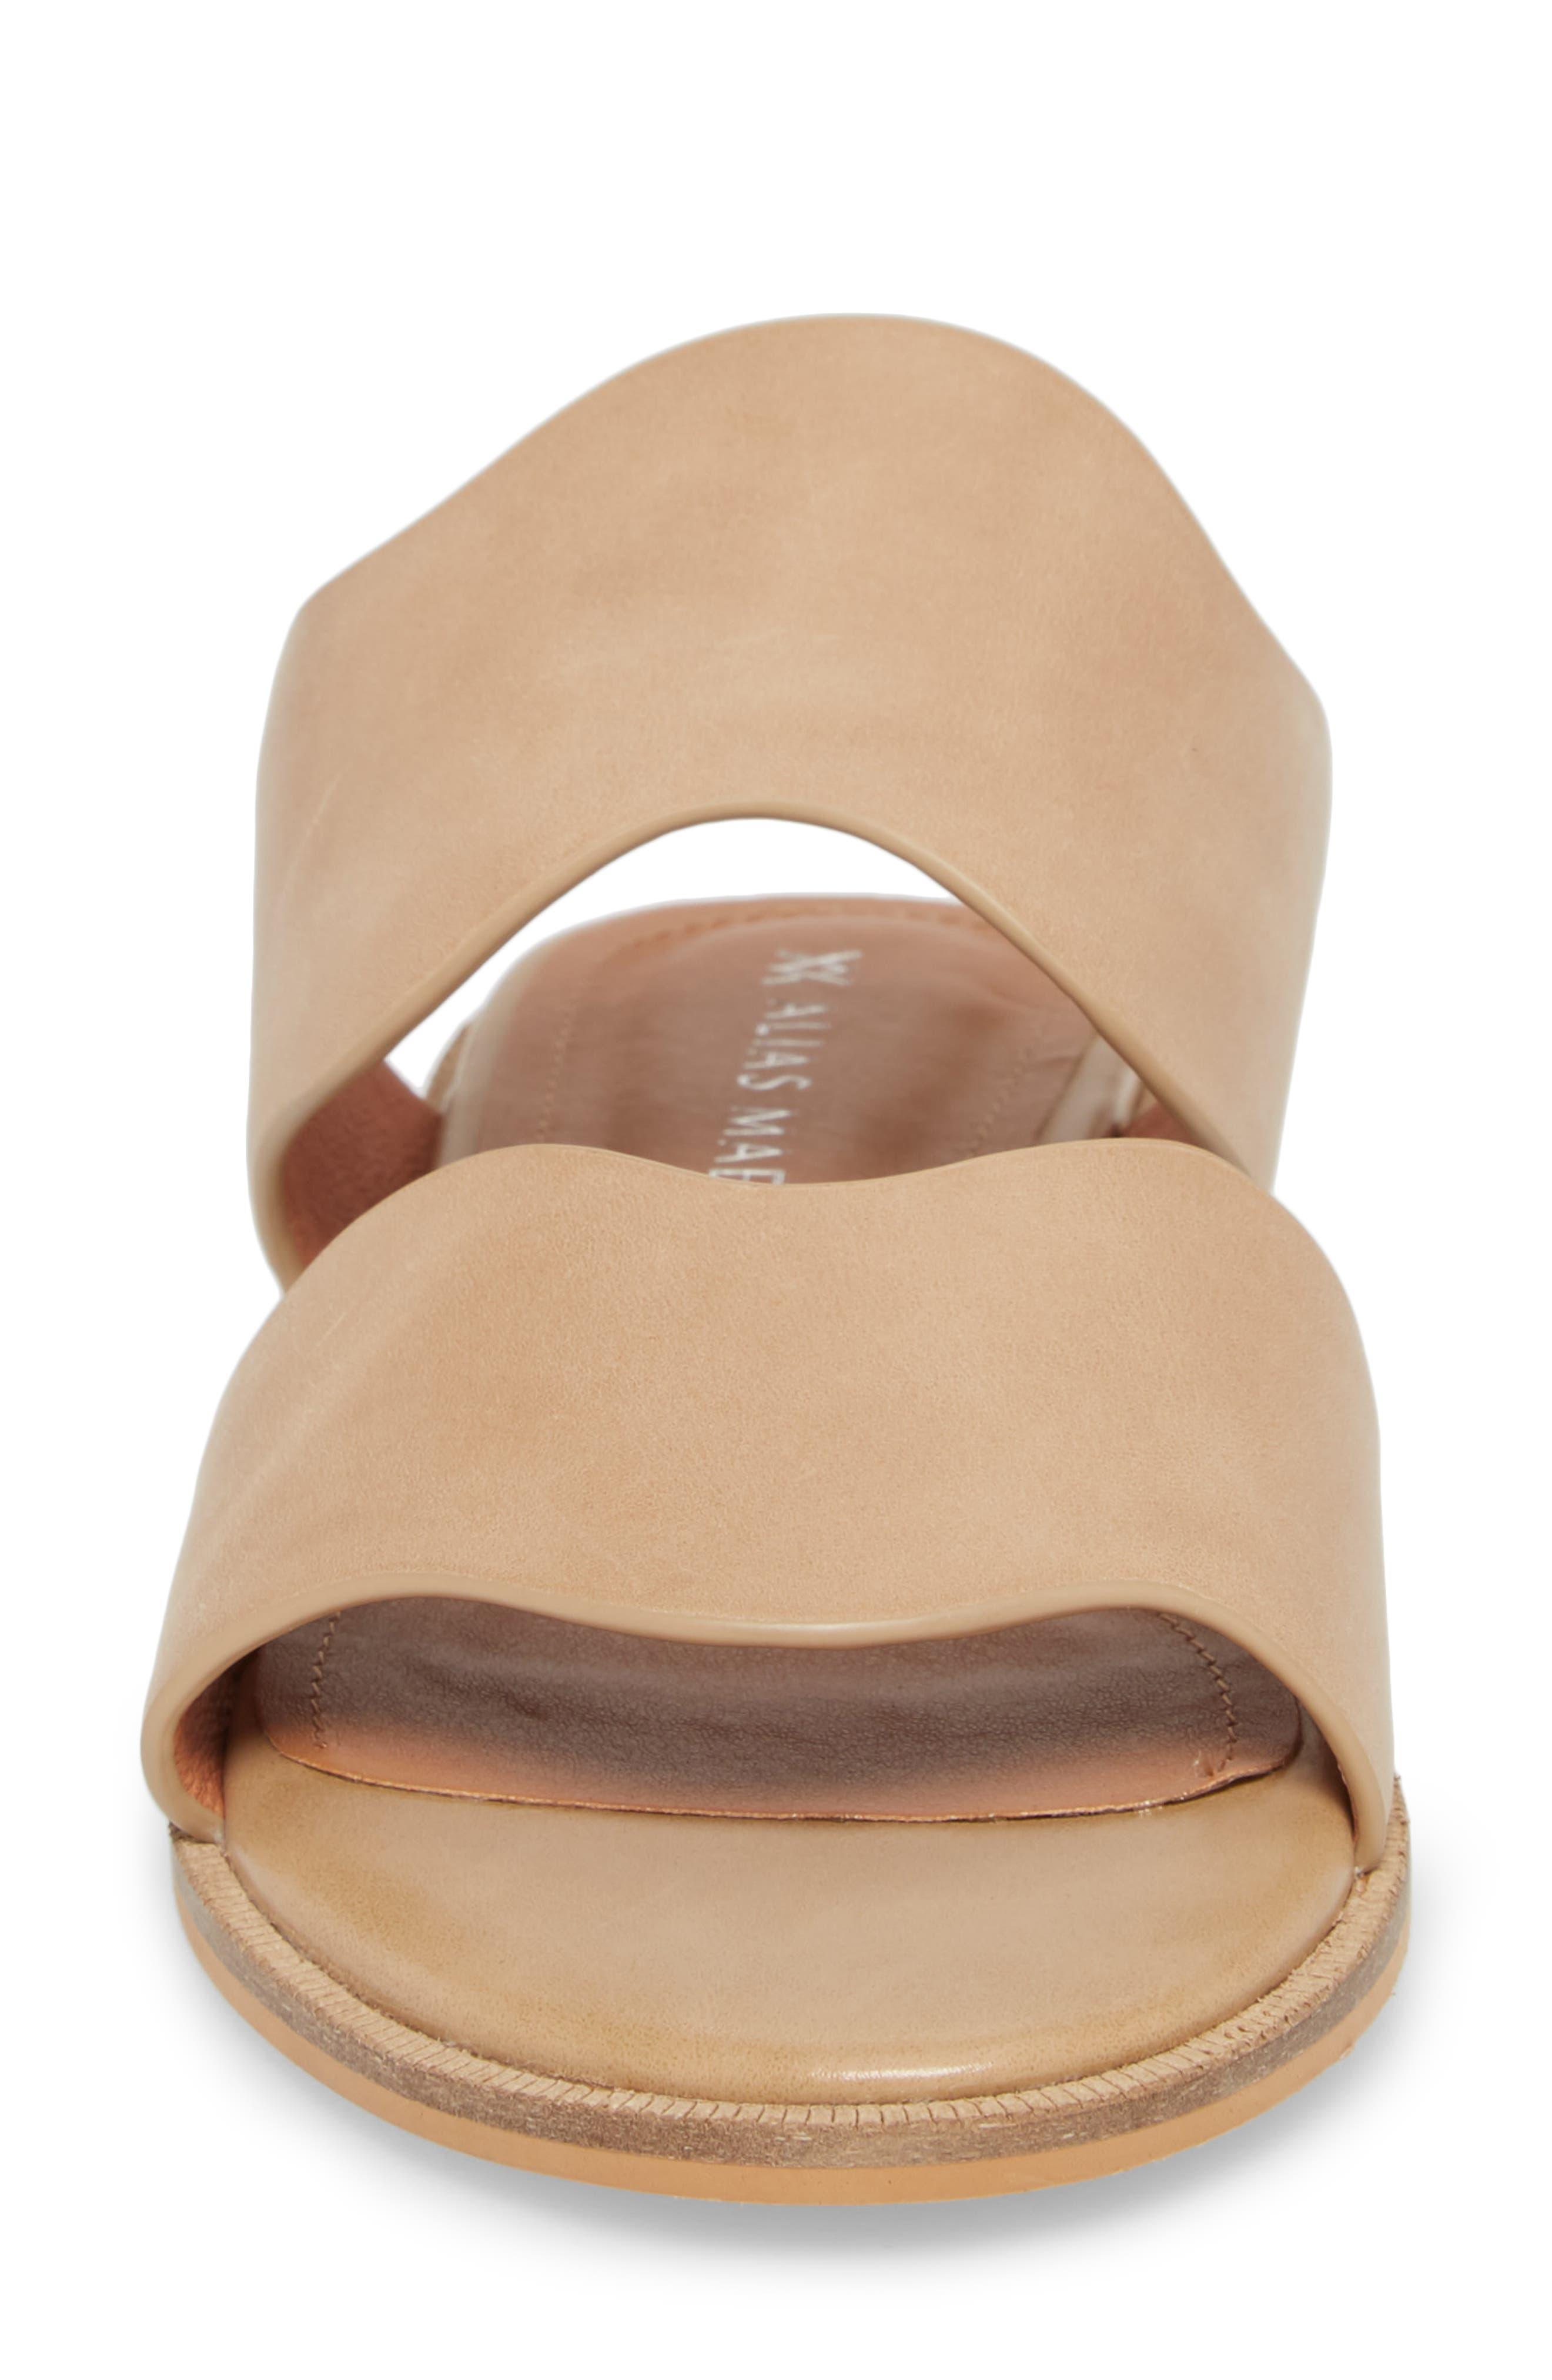 Thermos Scalloped Slide Sandal,                             Alternate thumbnail 4, color,                             250